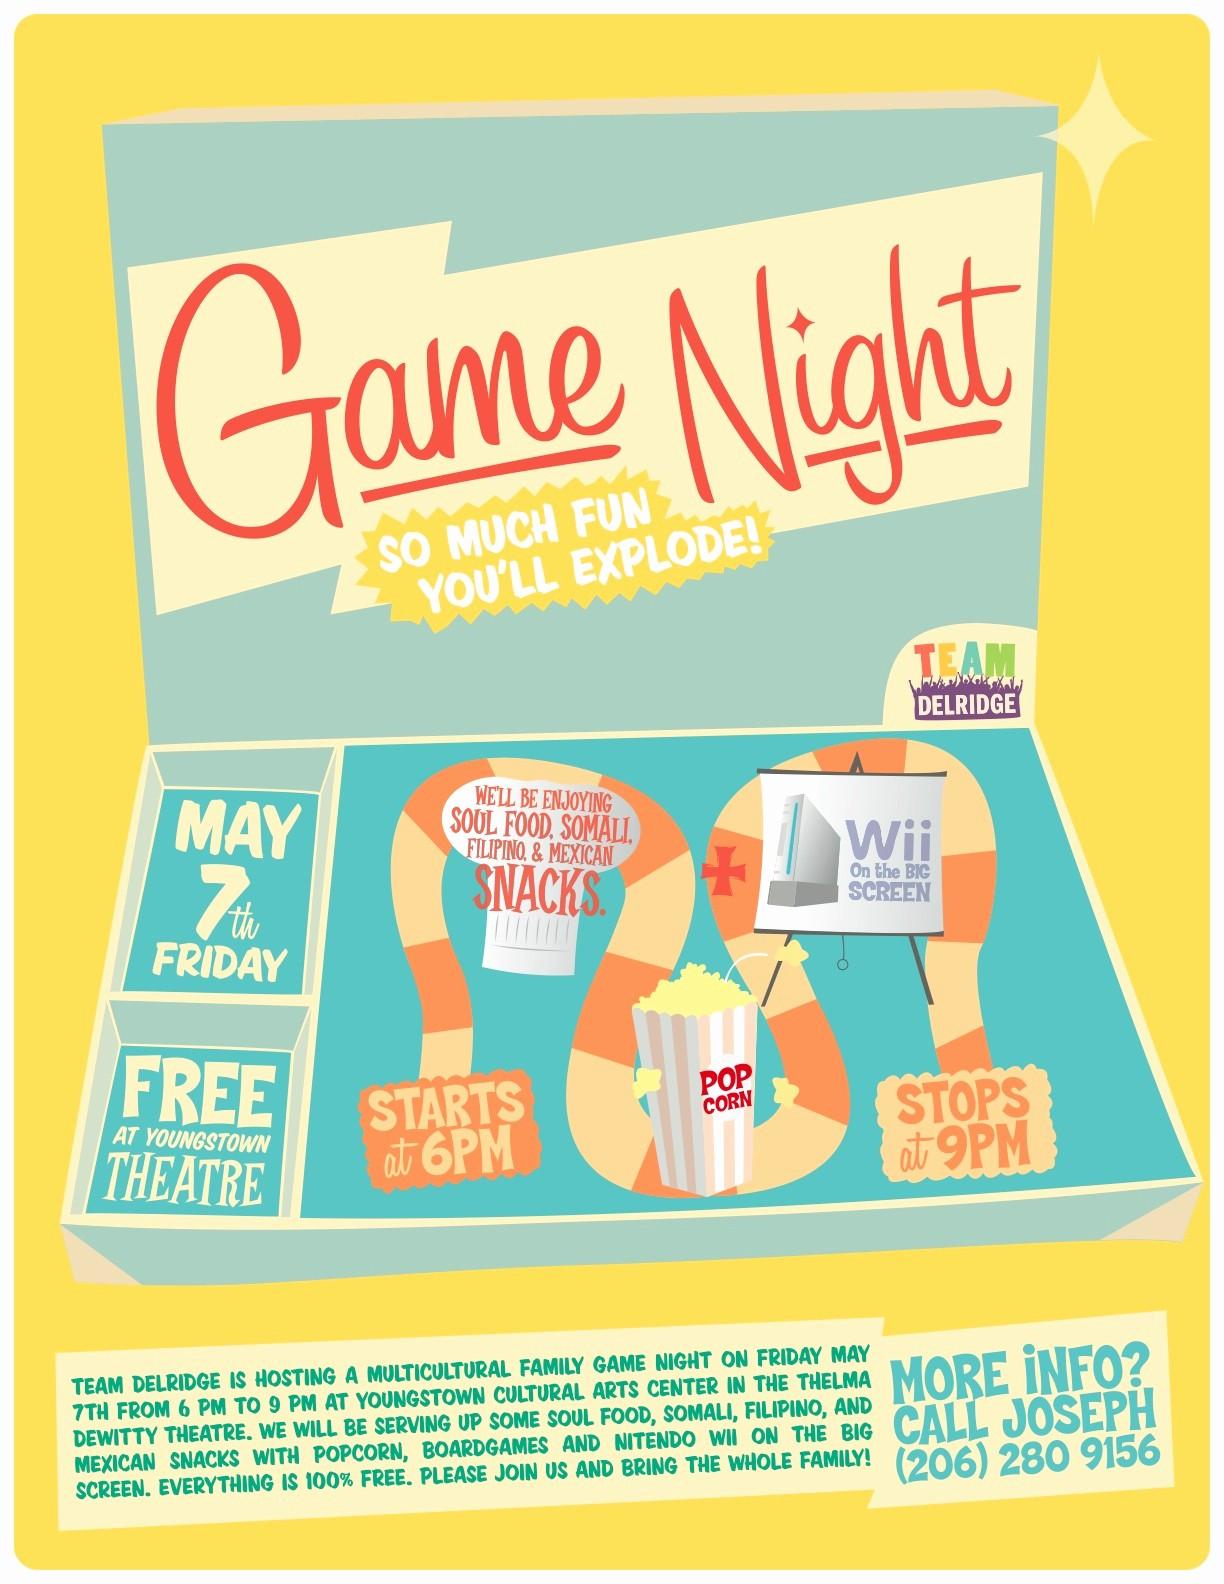 Family Fun Night Flyer Template Luxury Game Night Flyer Template Yourweek Eca25e